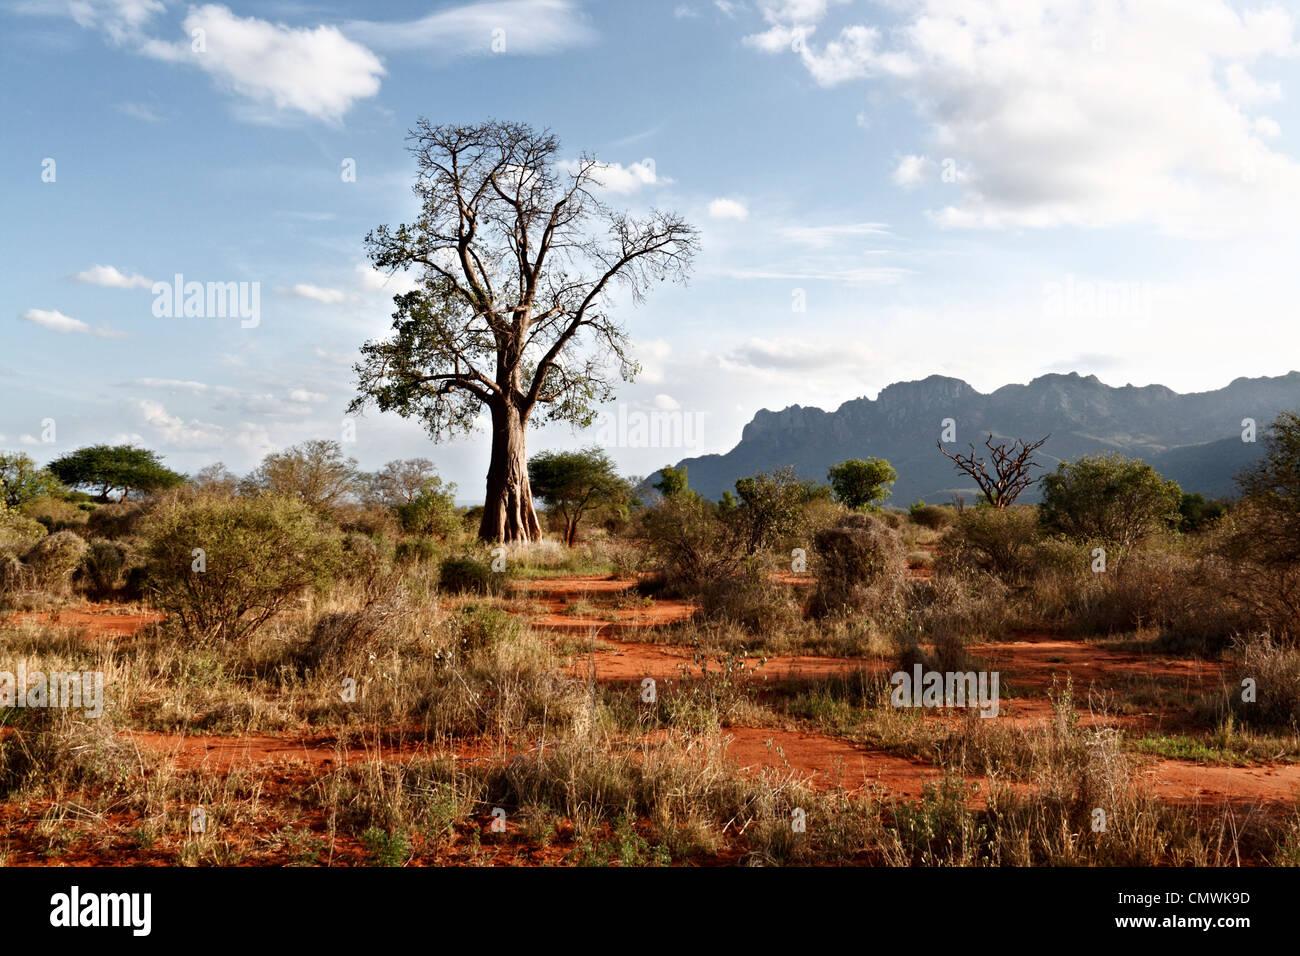 afrikanischer affenbrotbaum stockfoto bild 47277817 alamy. Black Bedroom Furniture Sets. Home Design Ideas